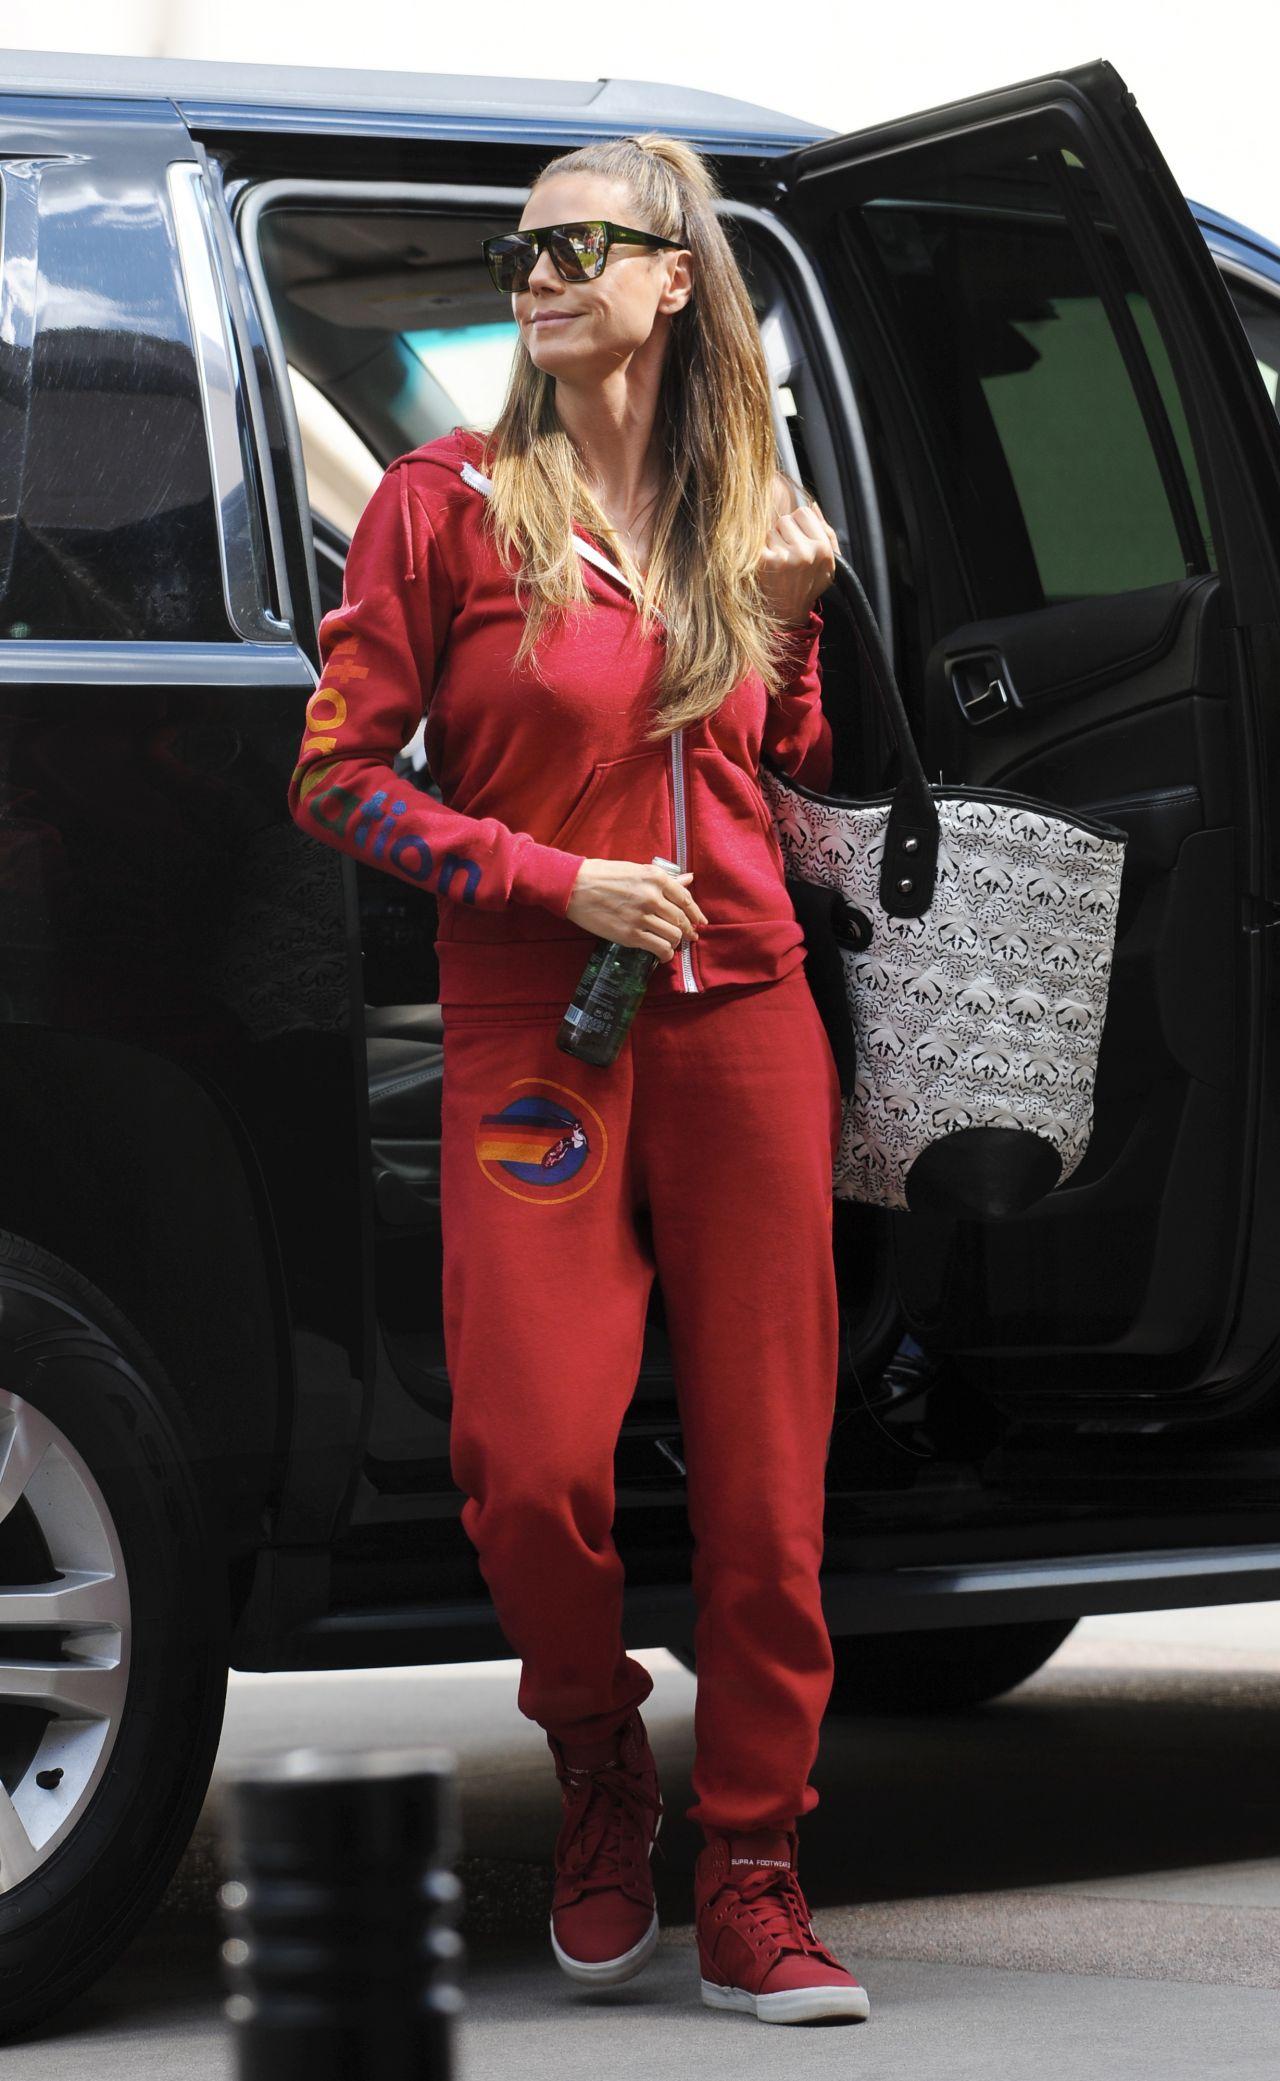 Heidi Klum Arriving For The Quot Americas Got Talent